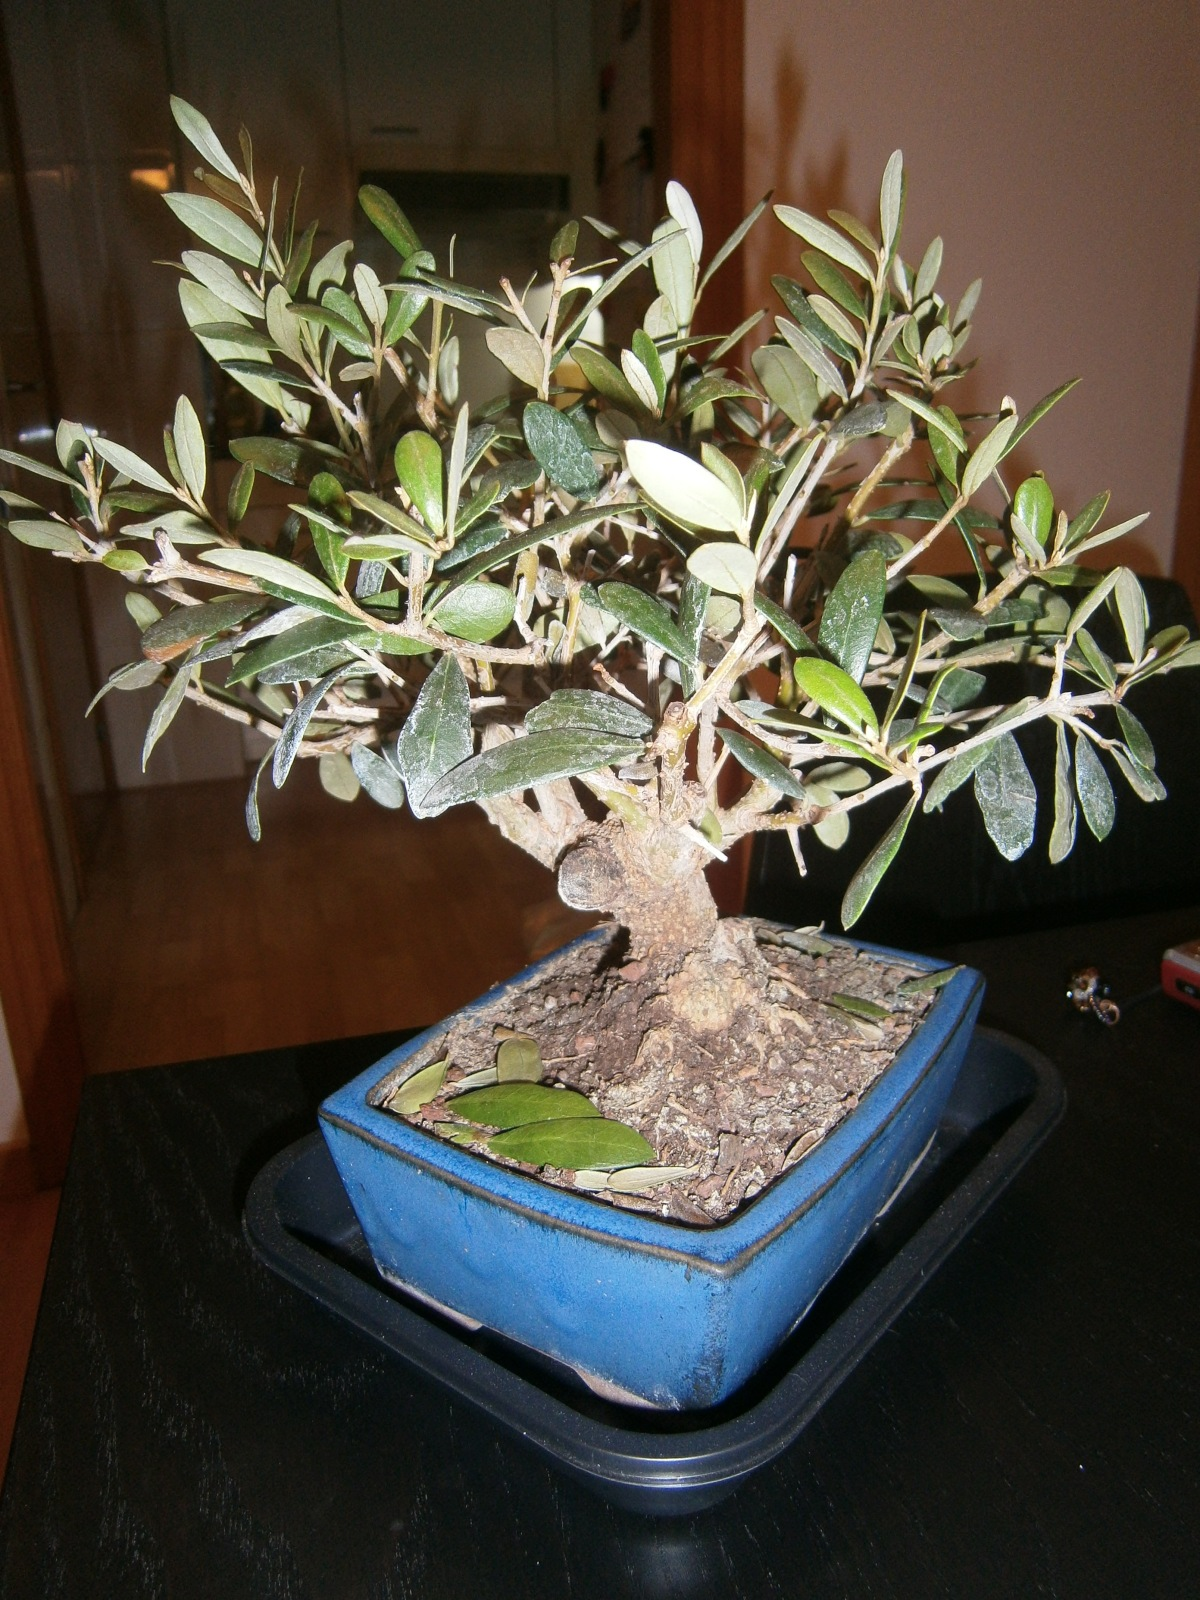 Caída de hojas - Bonsai Olivo 2912t5s